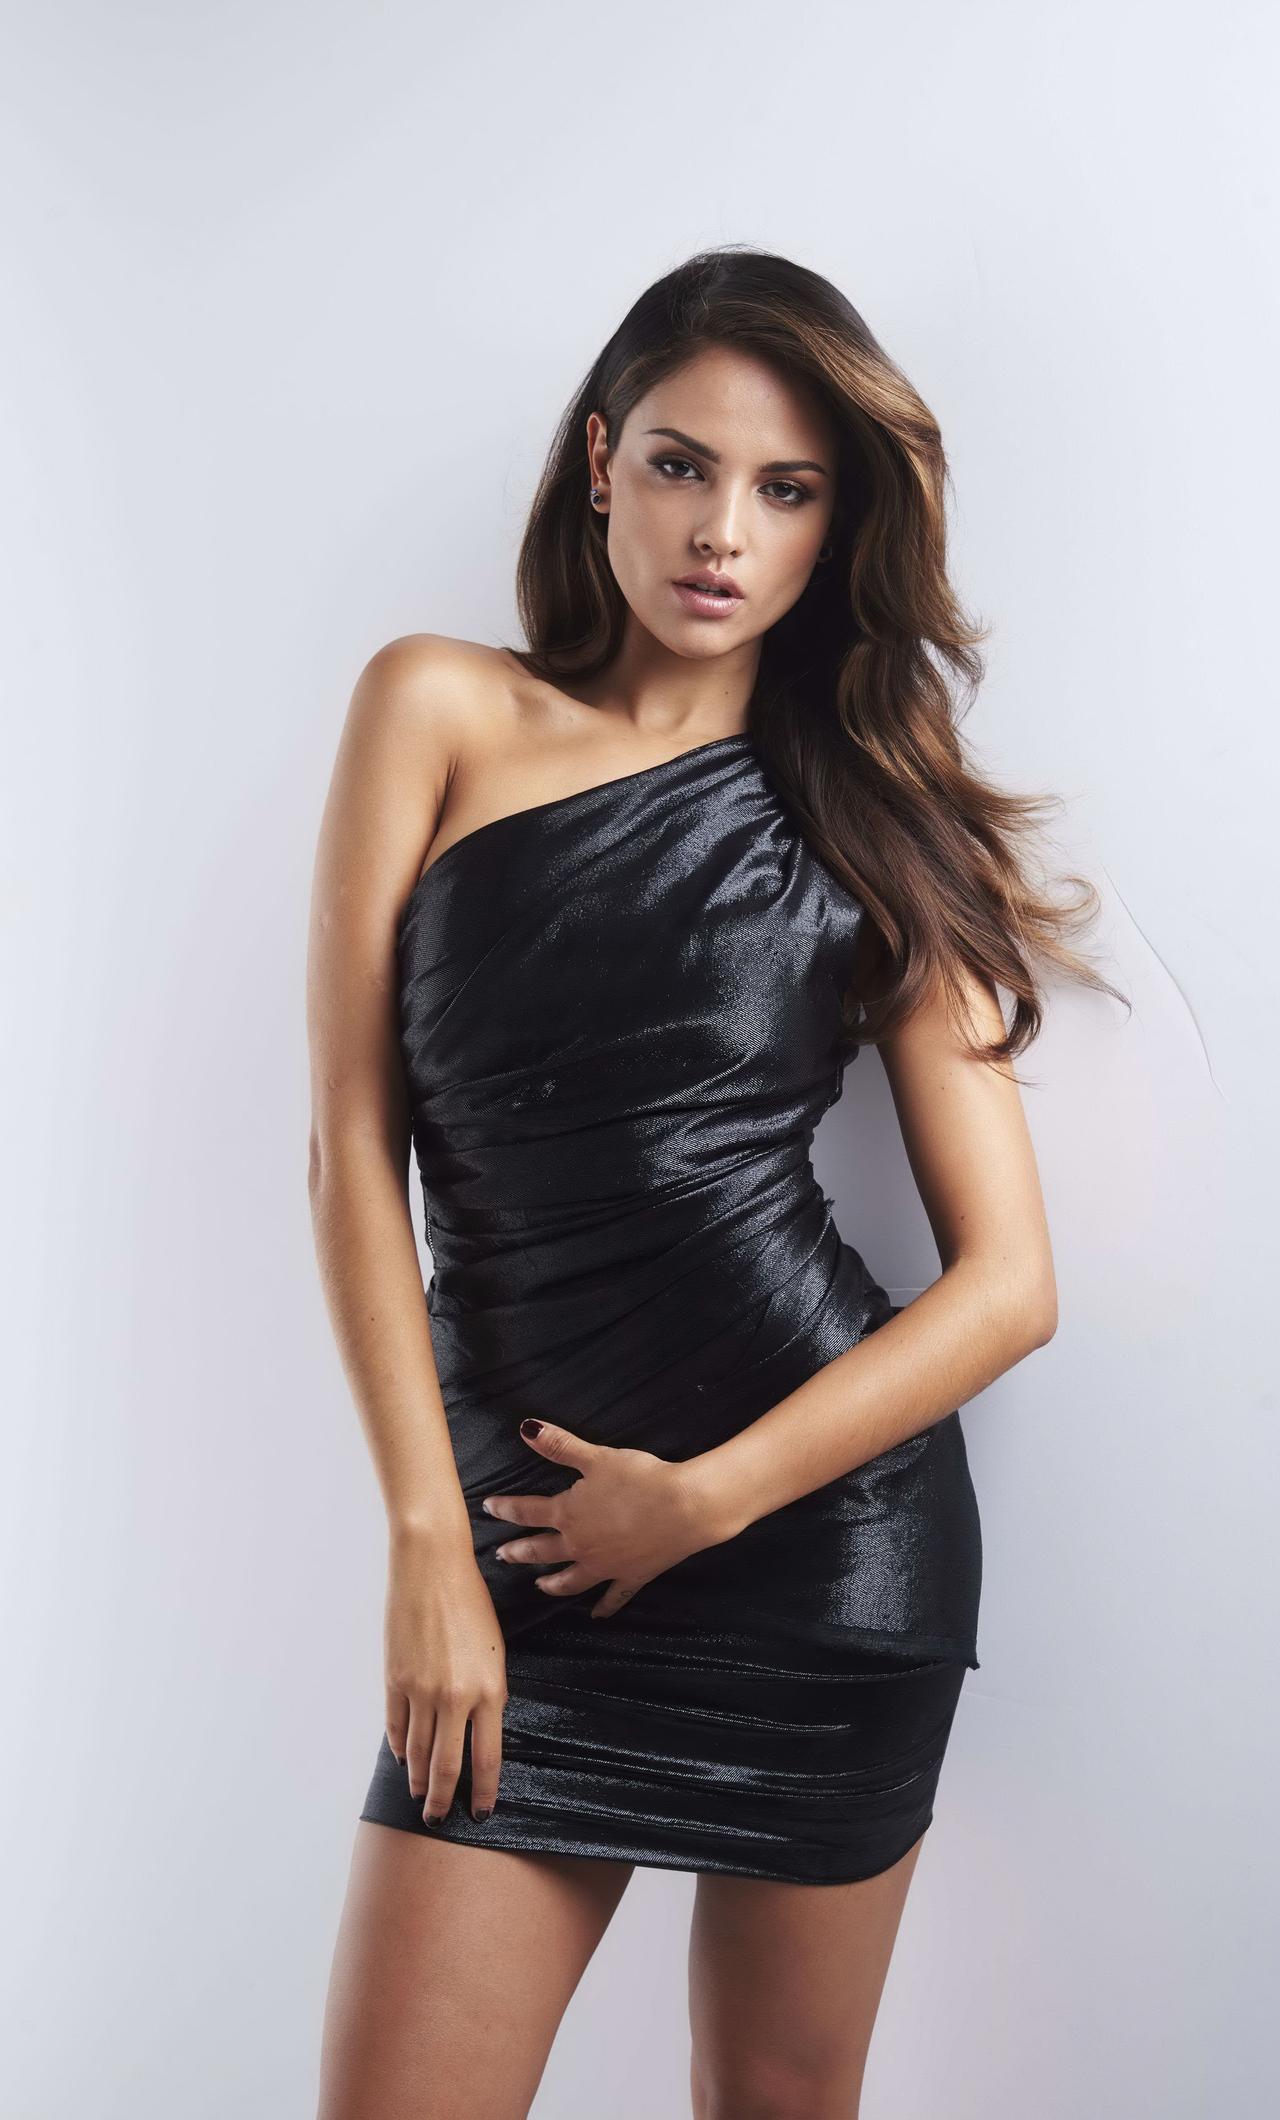 eiza-gonzalez-variety-latino-portrait-5k-aj.jpg